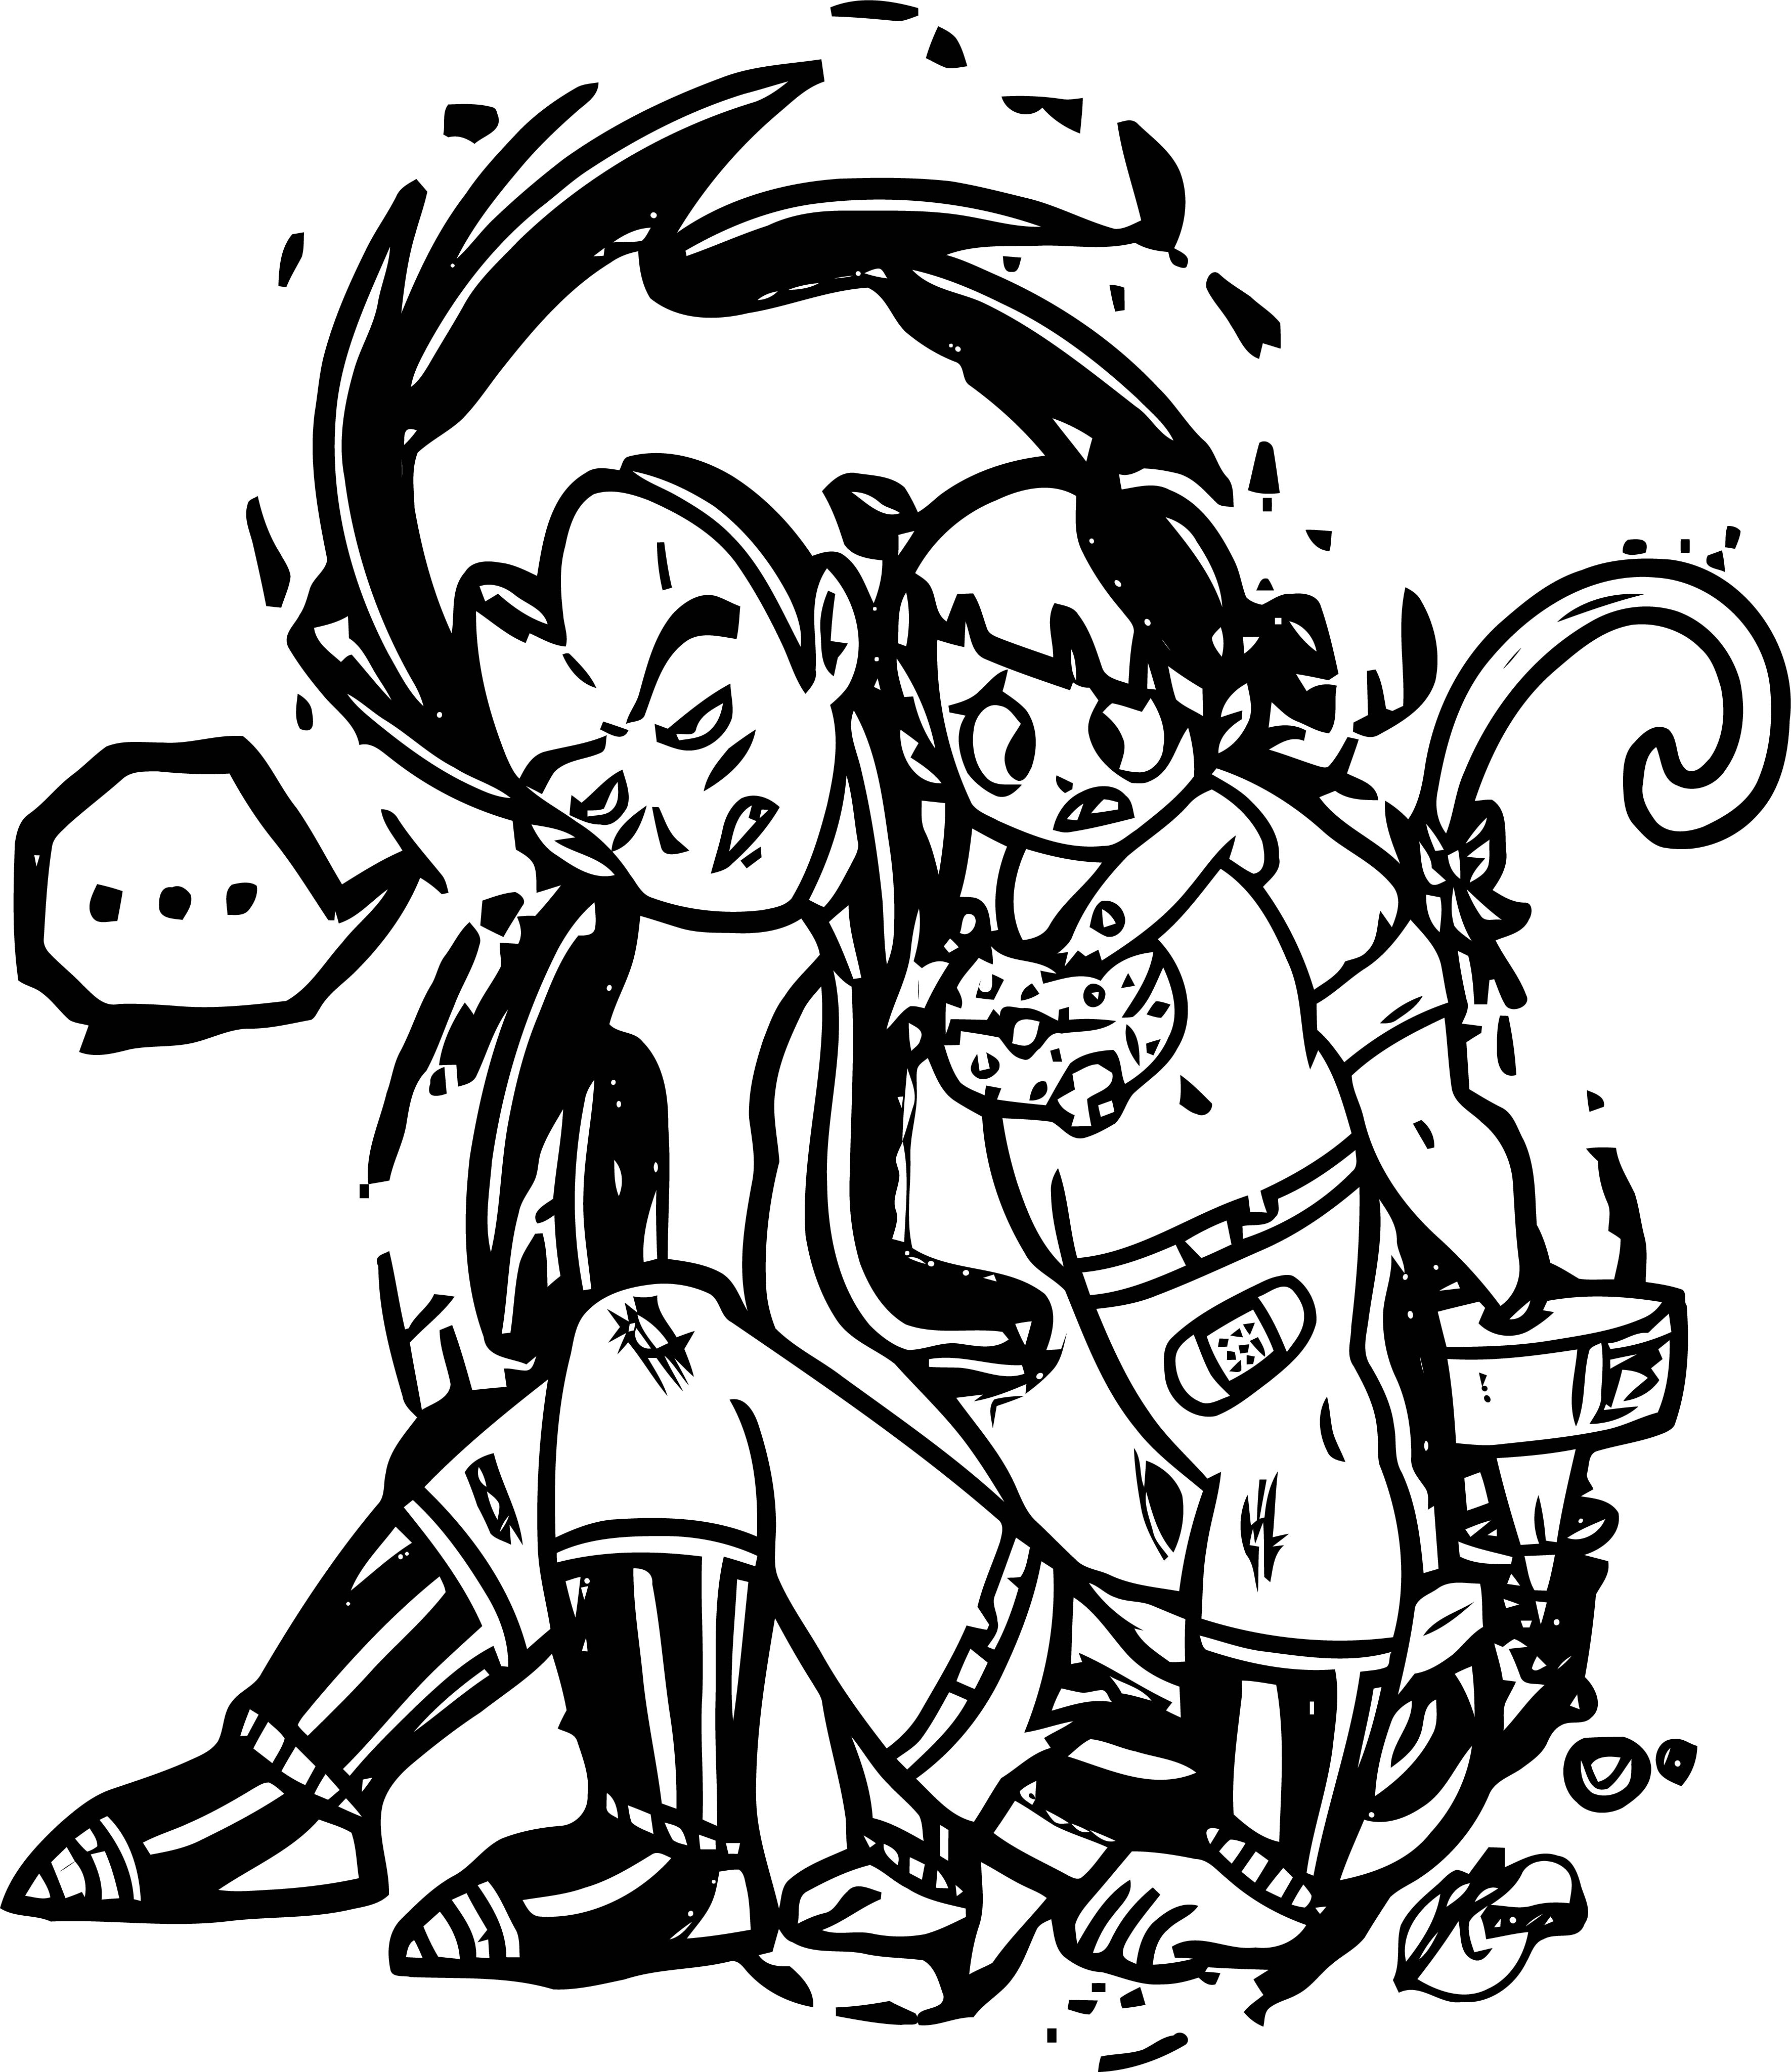 Manga Waiting Boy Girl Coloring Page